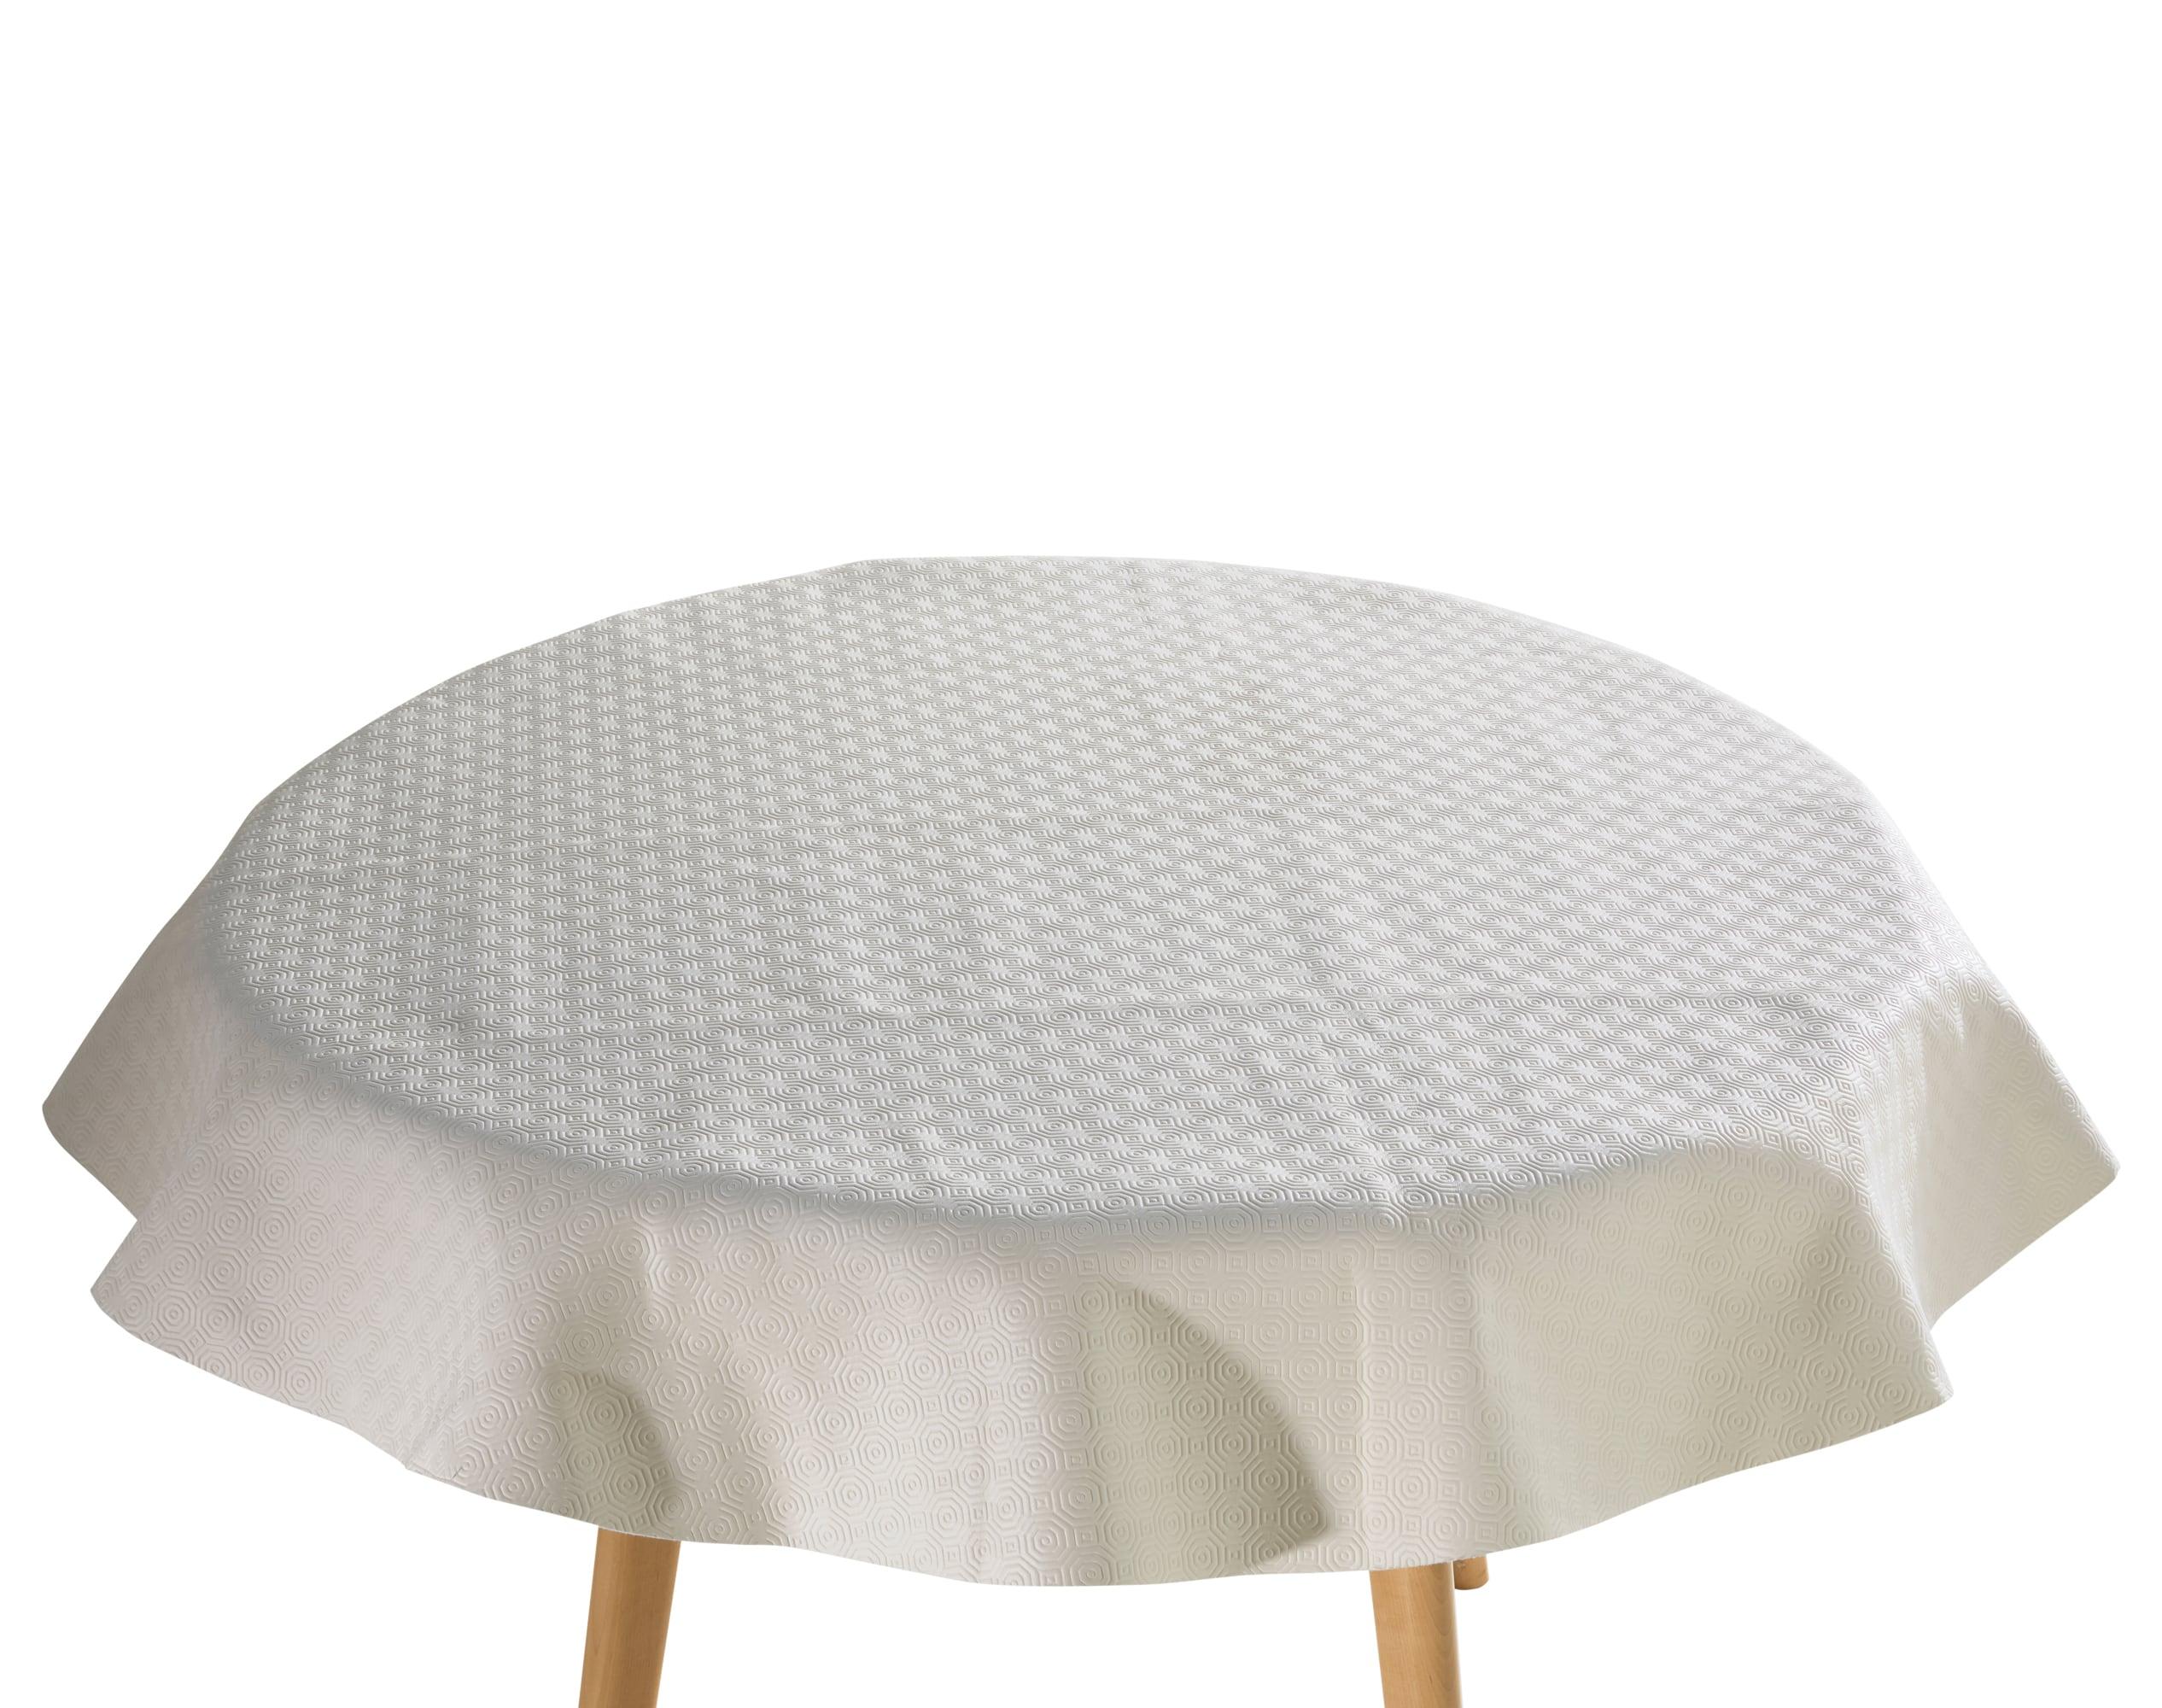 Protège-table standard rond blanc 150cm